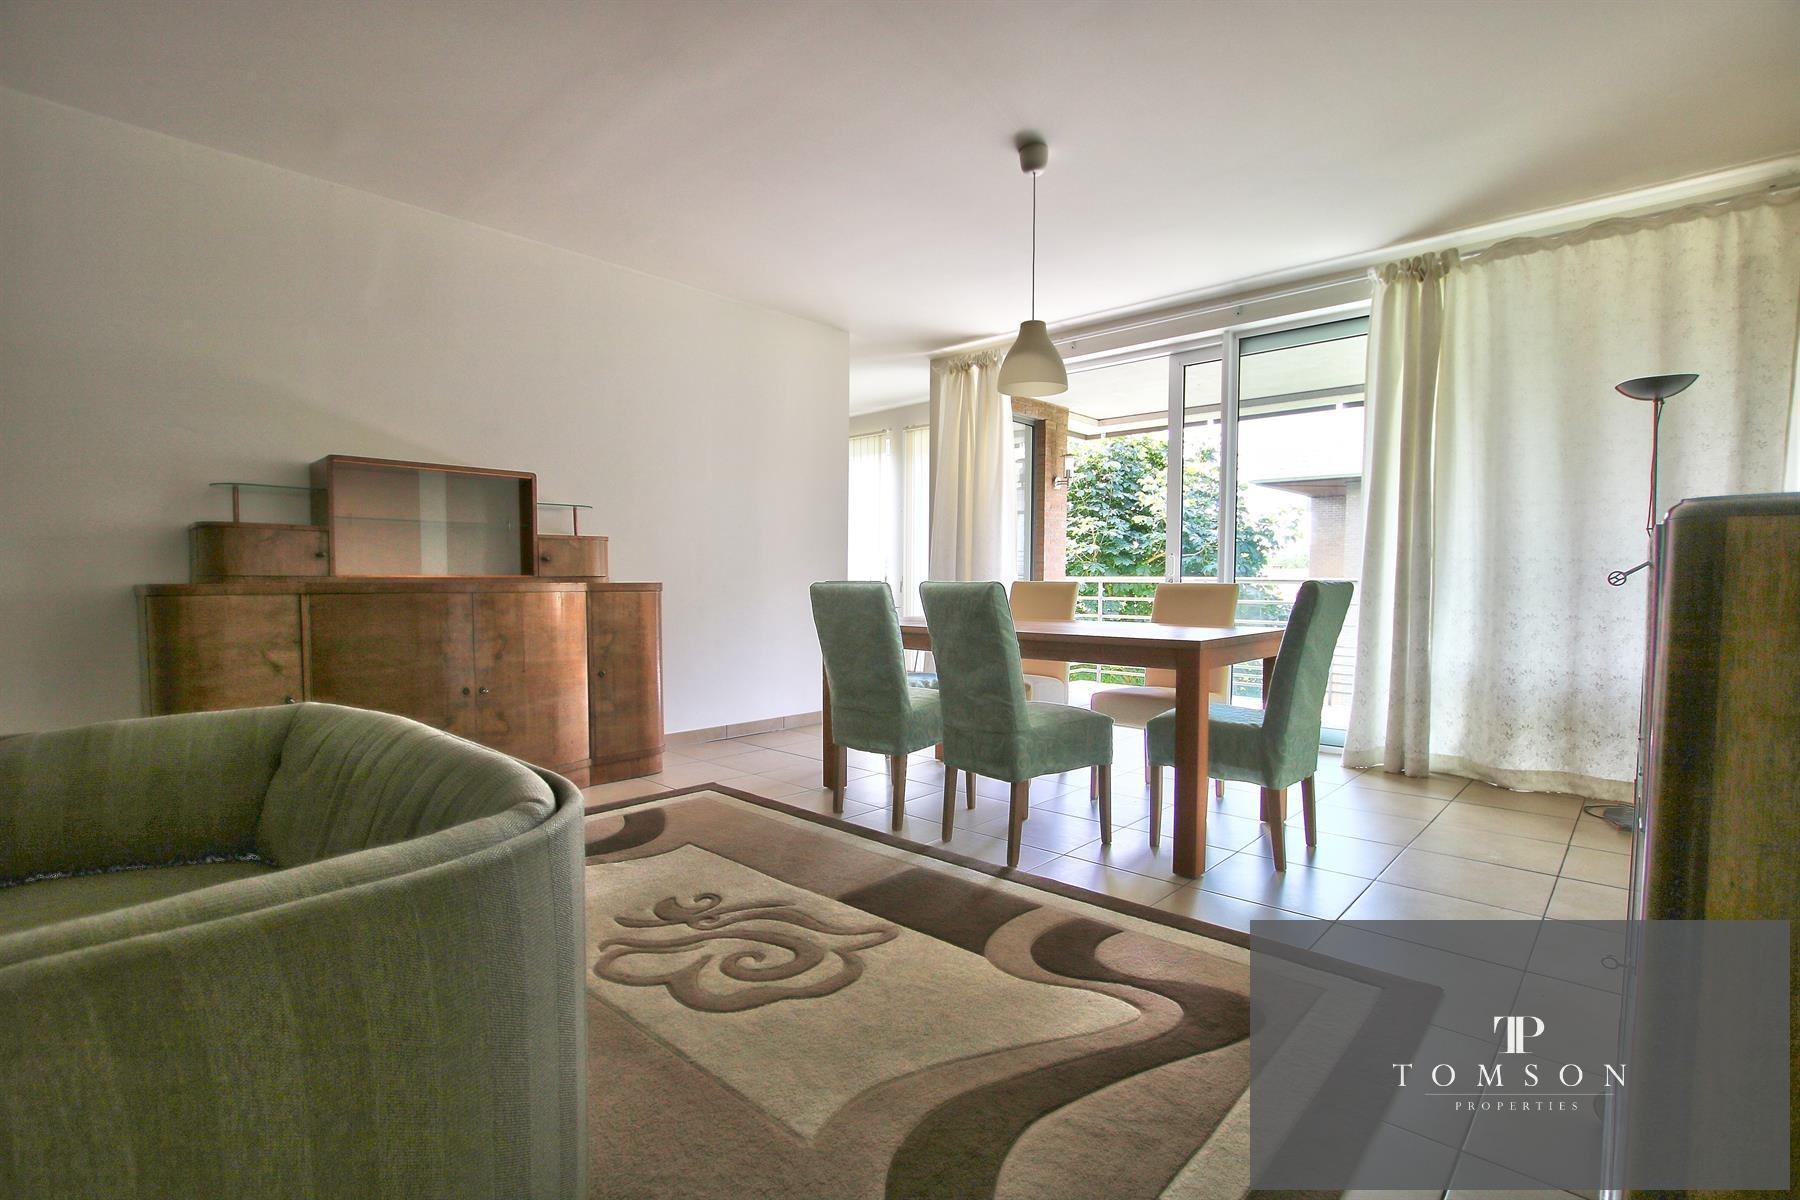 Appartement - Woluwe-Saint-Lambert - #4444905-2